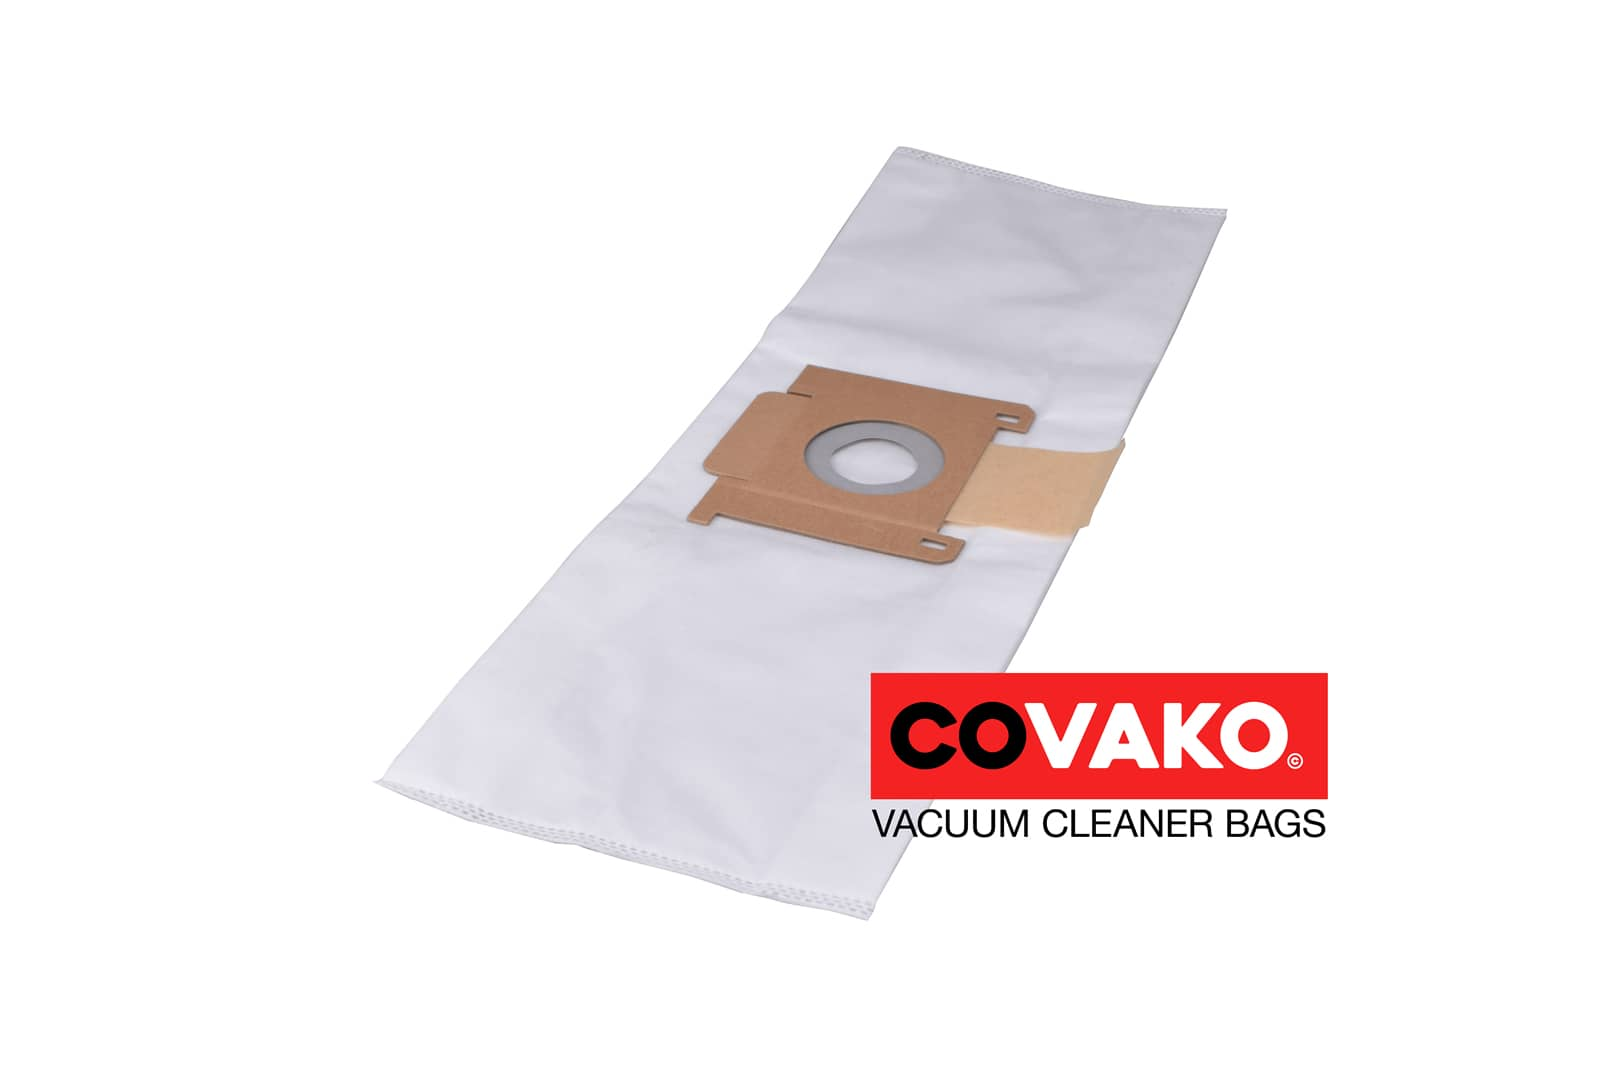 Clean a la Card C 06 / Synthetisch - Clean a la Card stofzuigerzakken